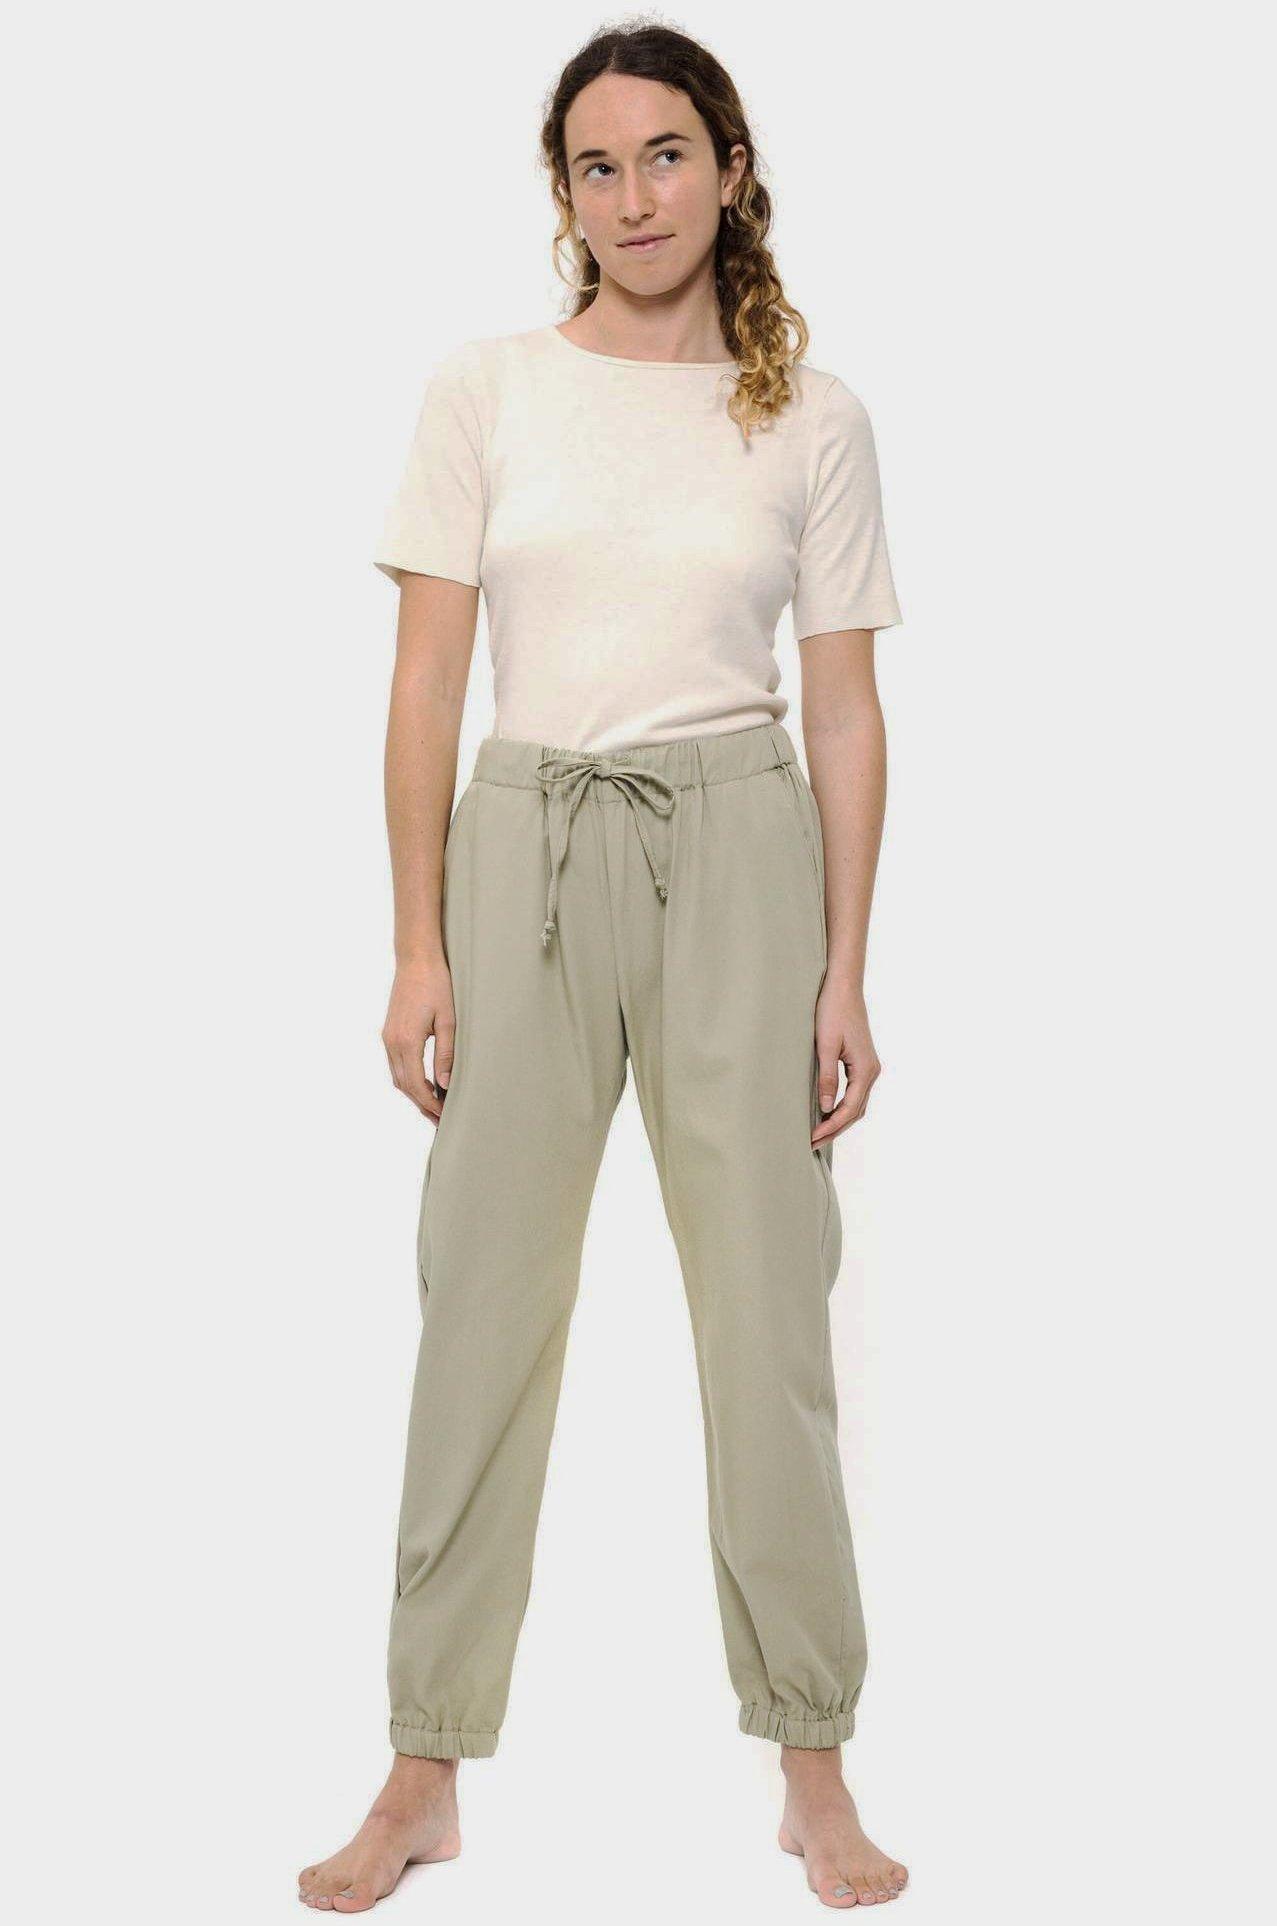 553497adbd Mollusk Beach Pants - Sage | Garmentory